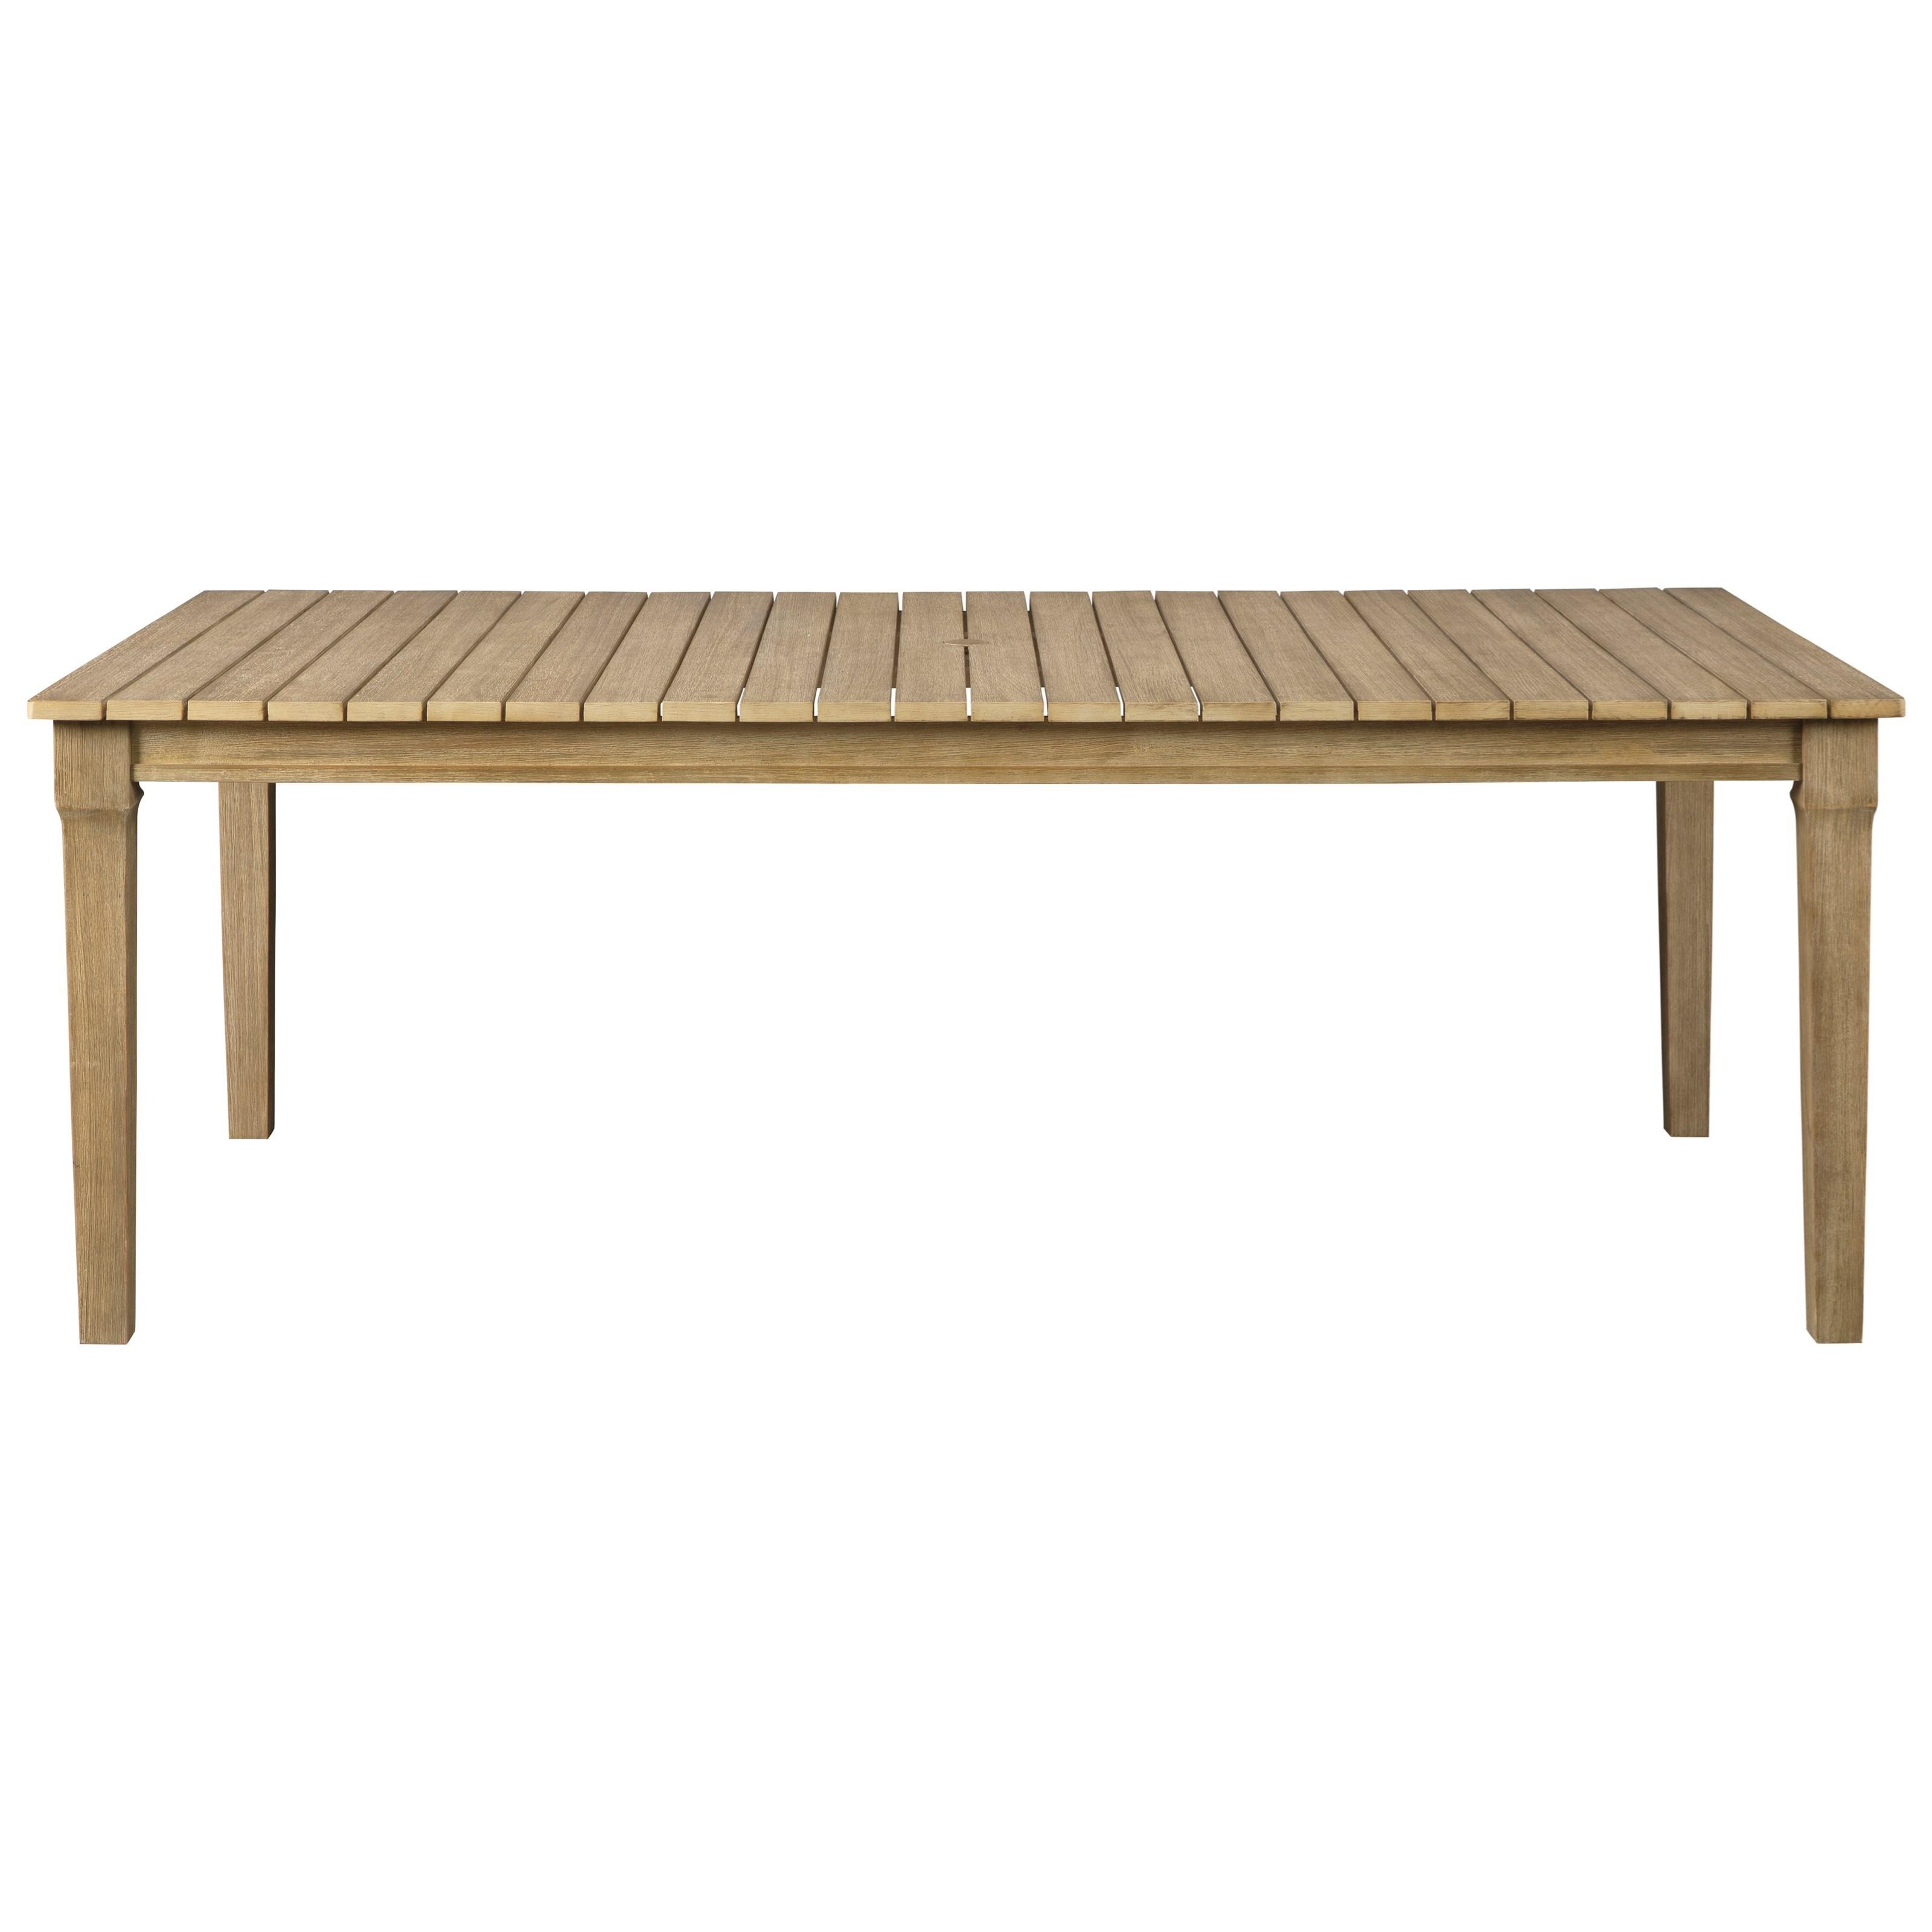 Levitz Furniture Store Locations: Signature Design By Ashley Clare View P801-625 Rectangular